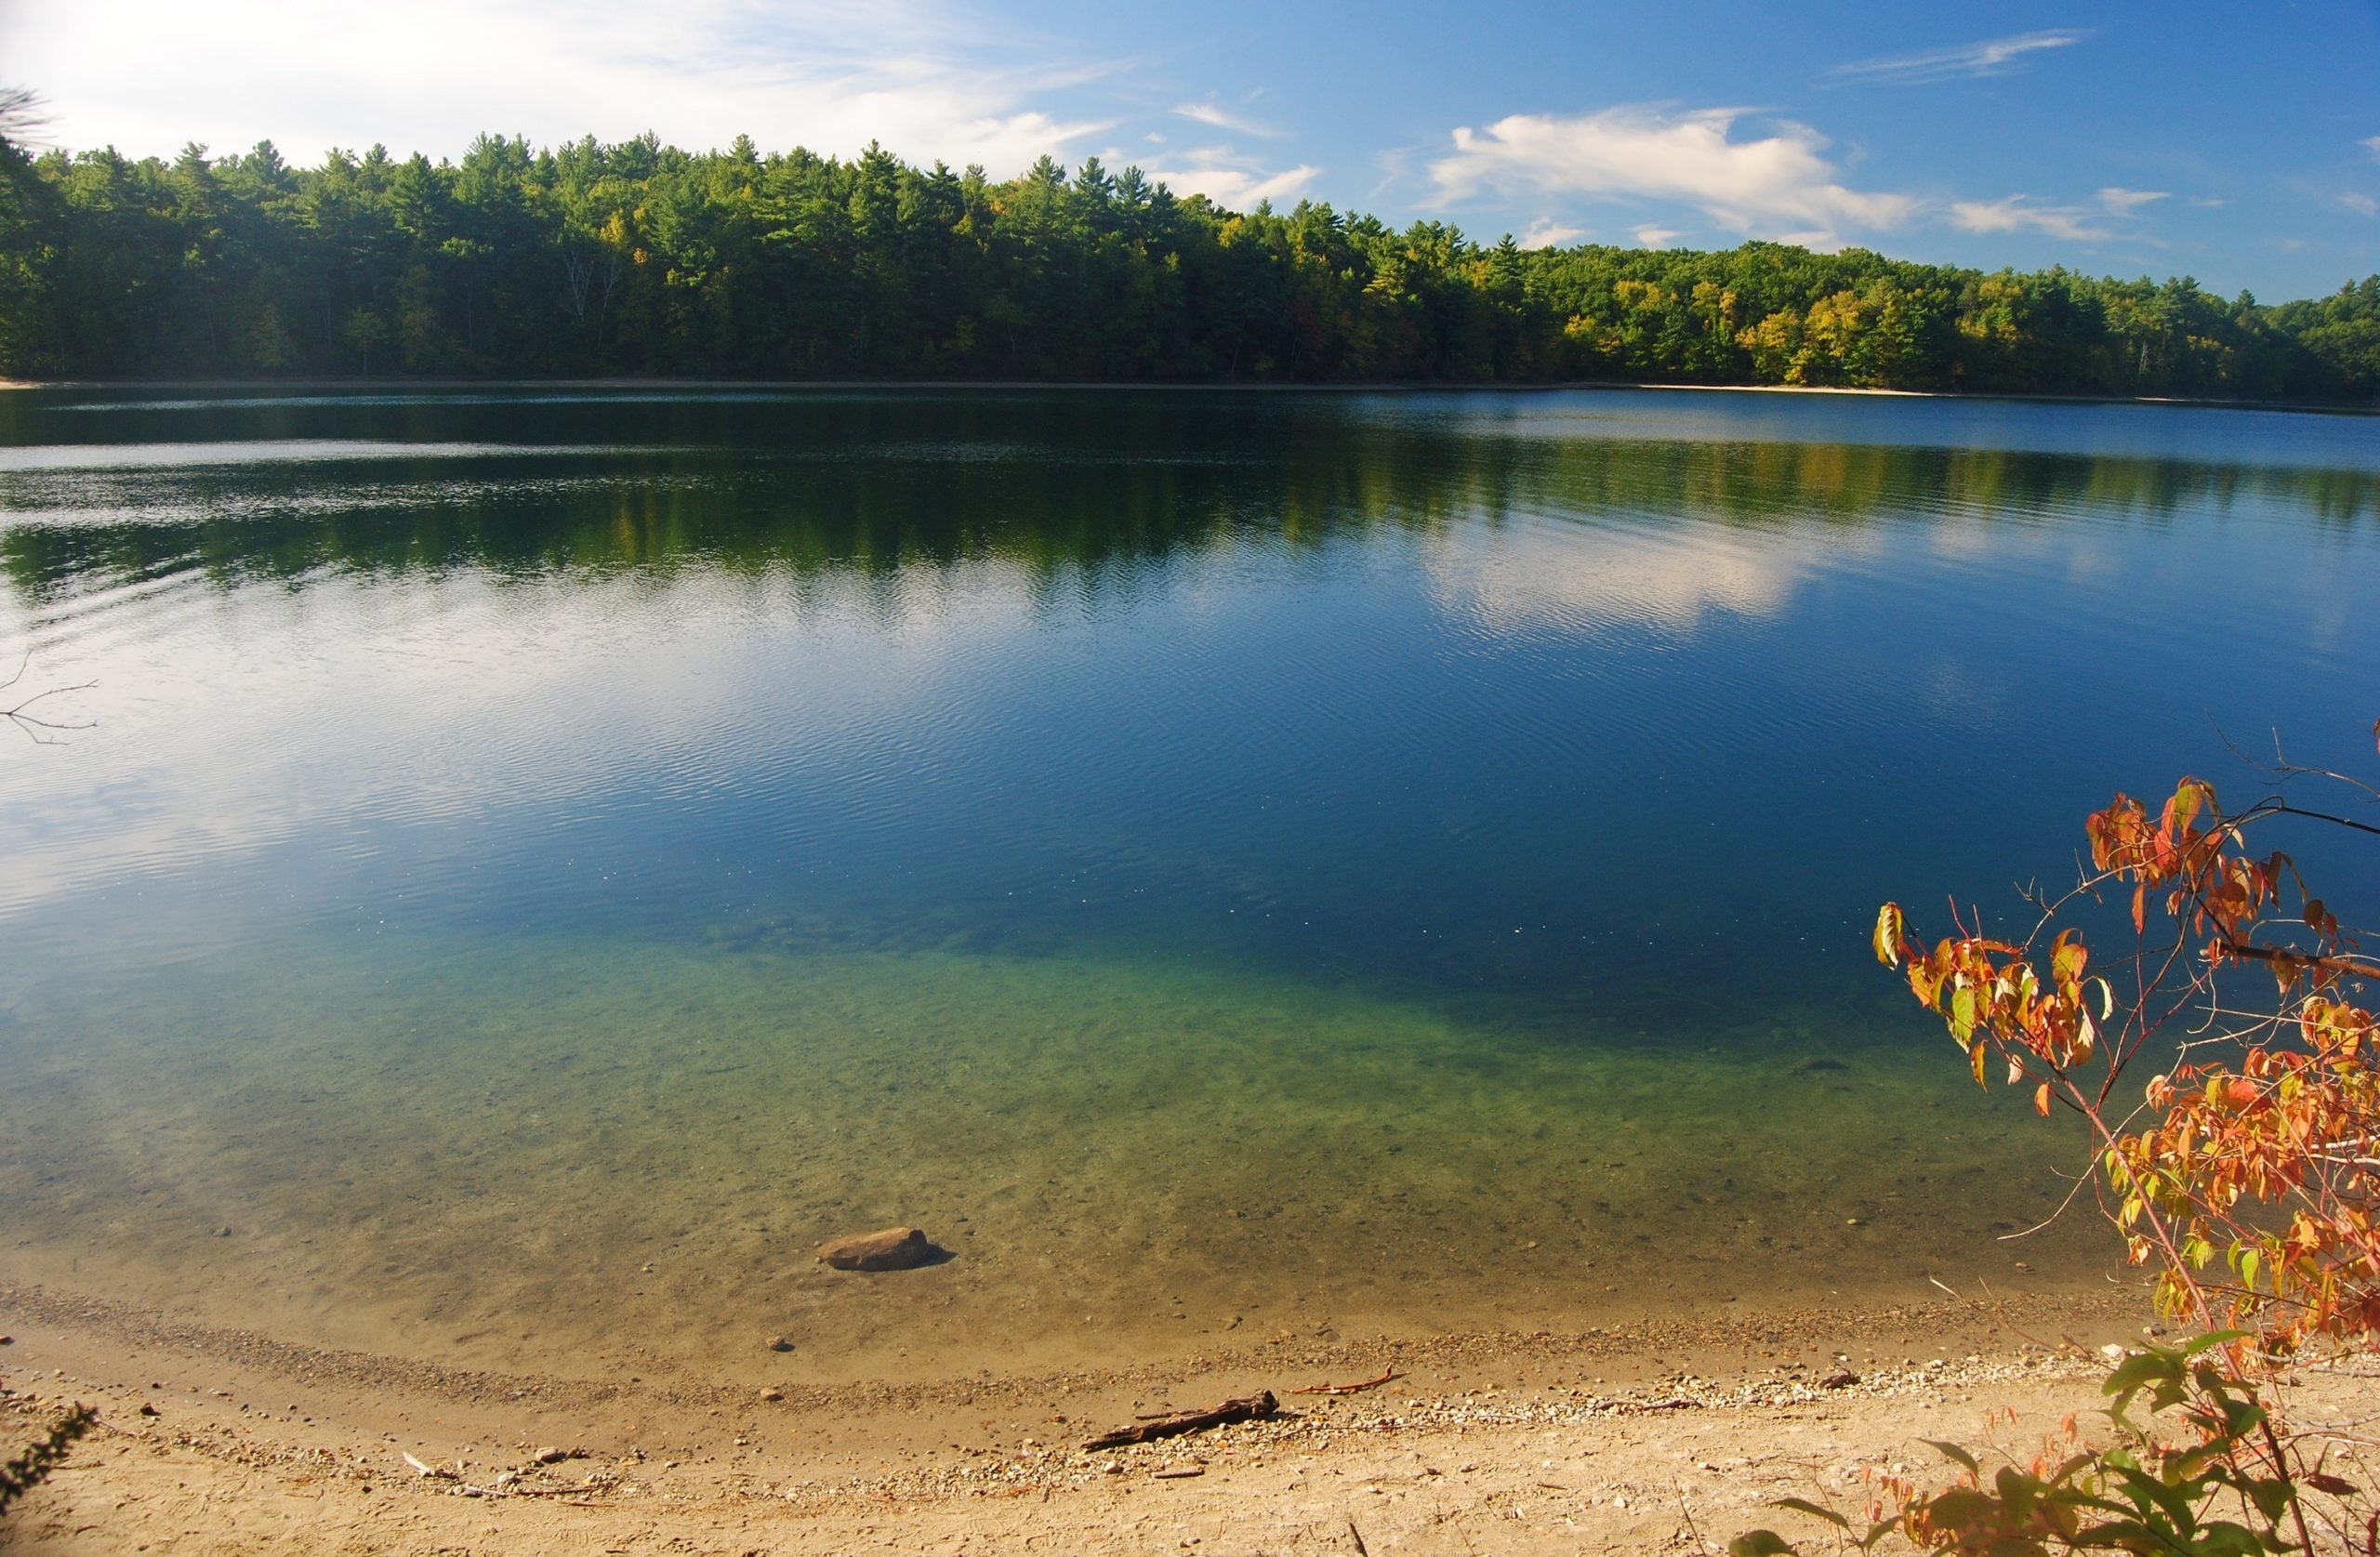 The Walden Pond in Massachusetts, USA.